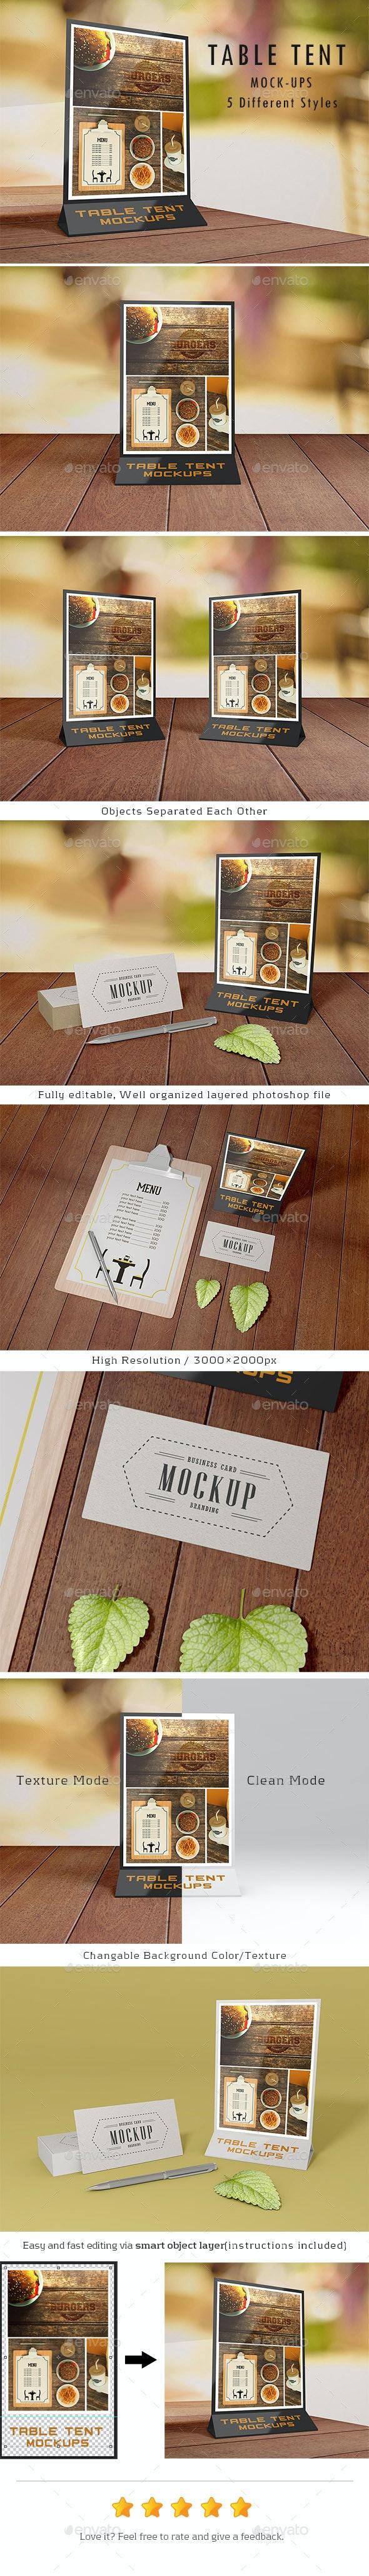 Table Tent Mock-Ups - Print Product Mock-Ups